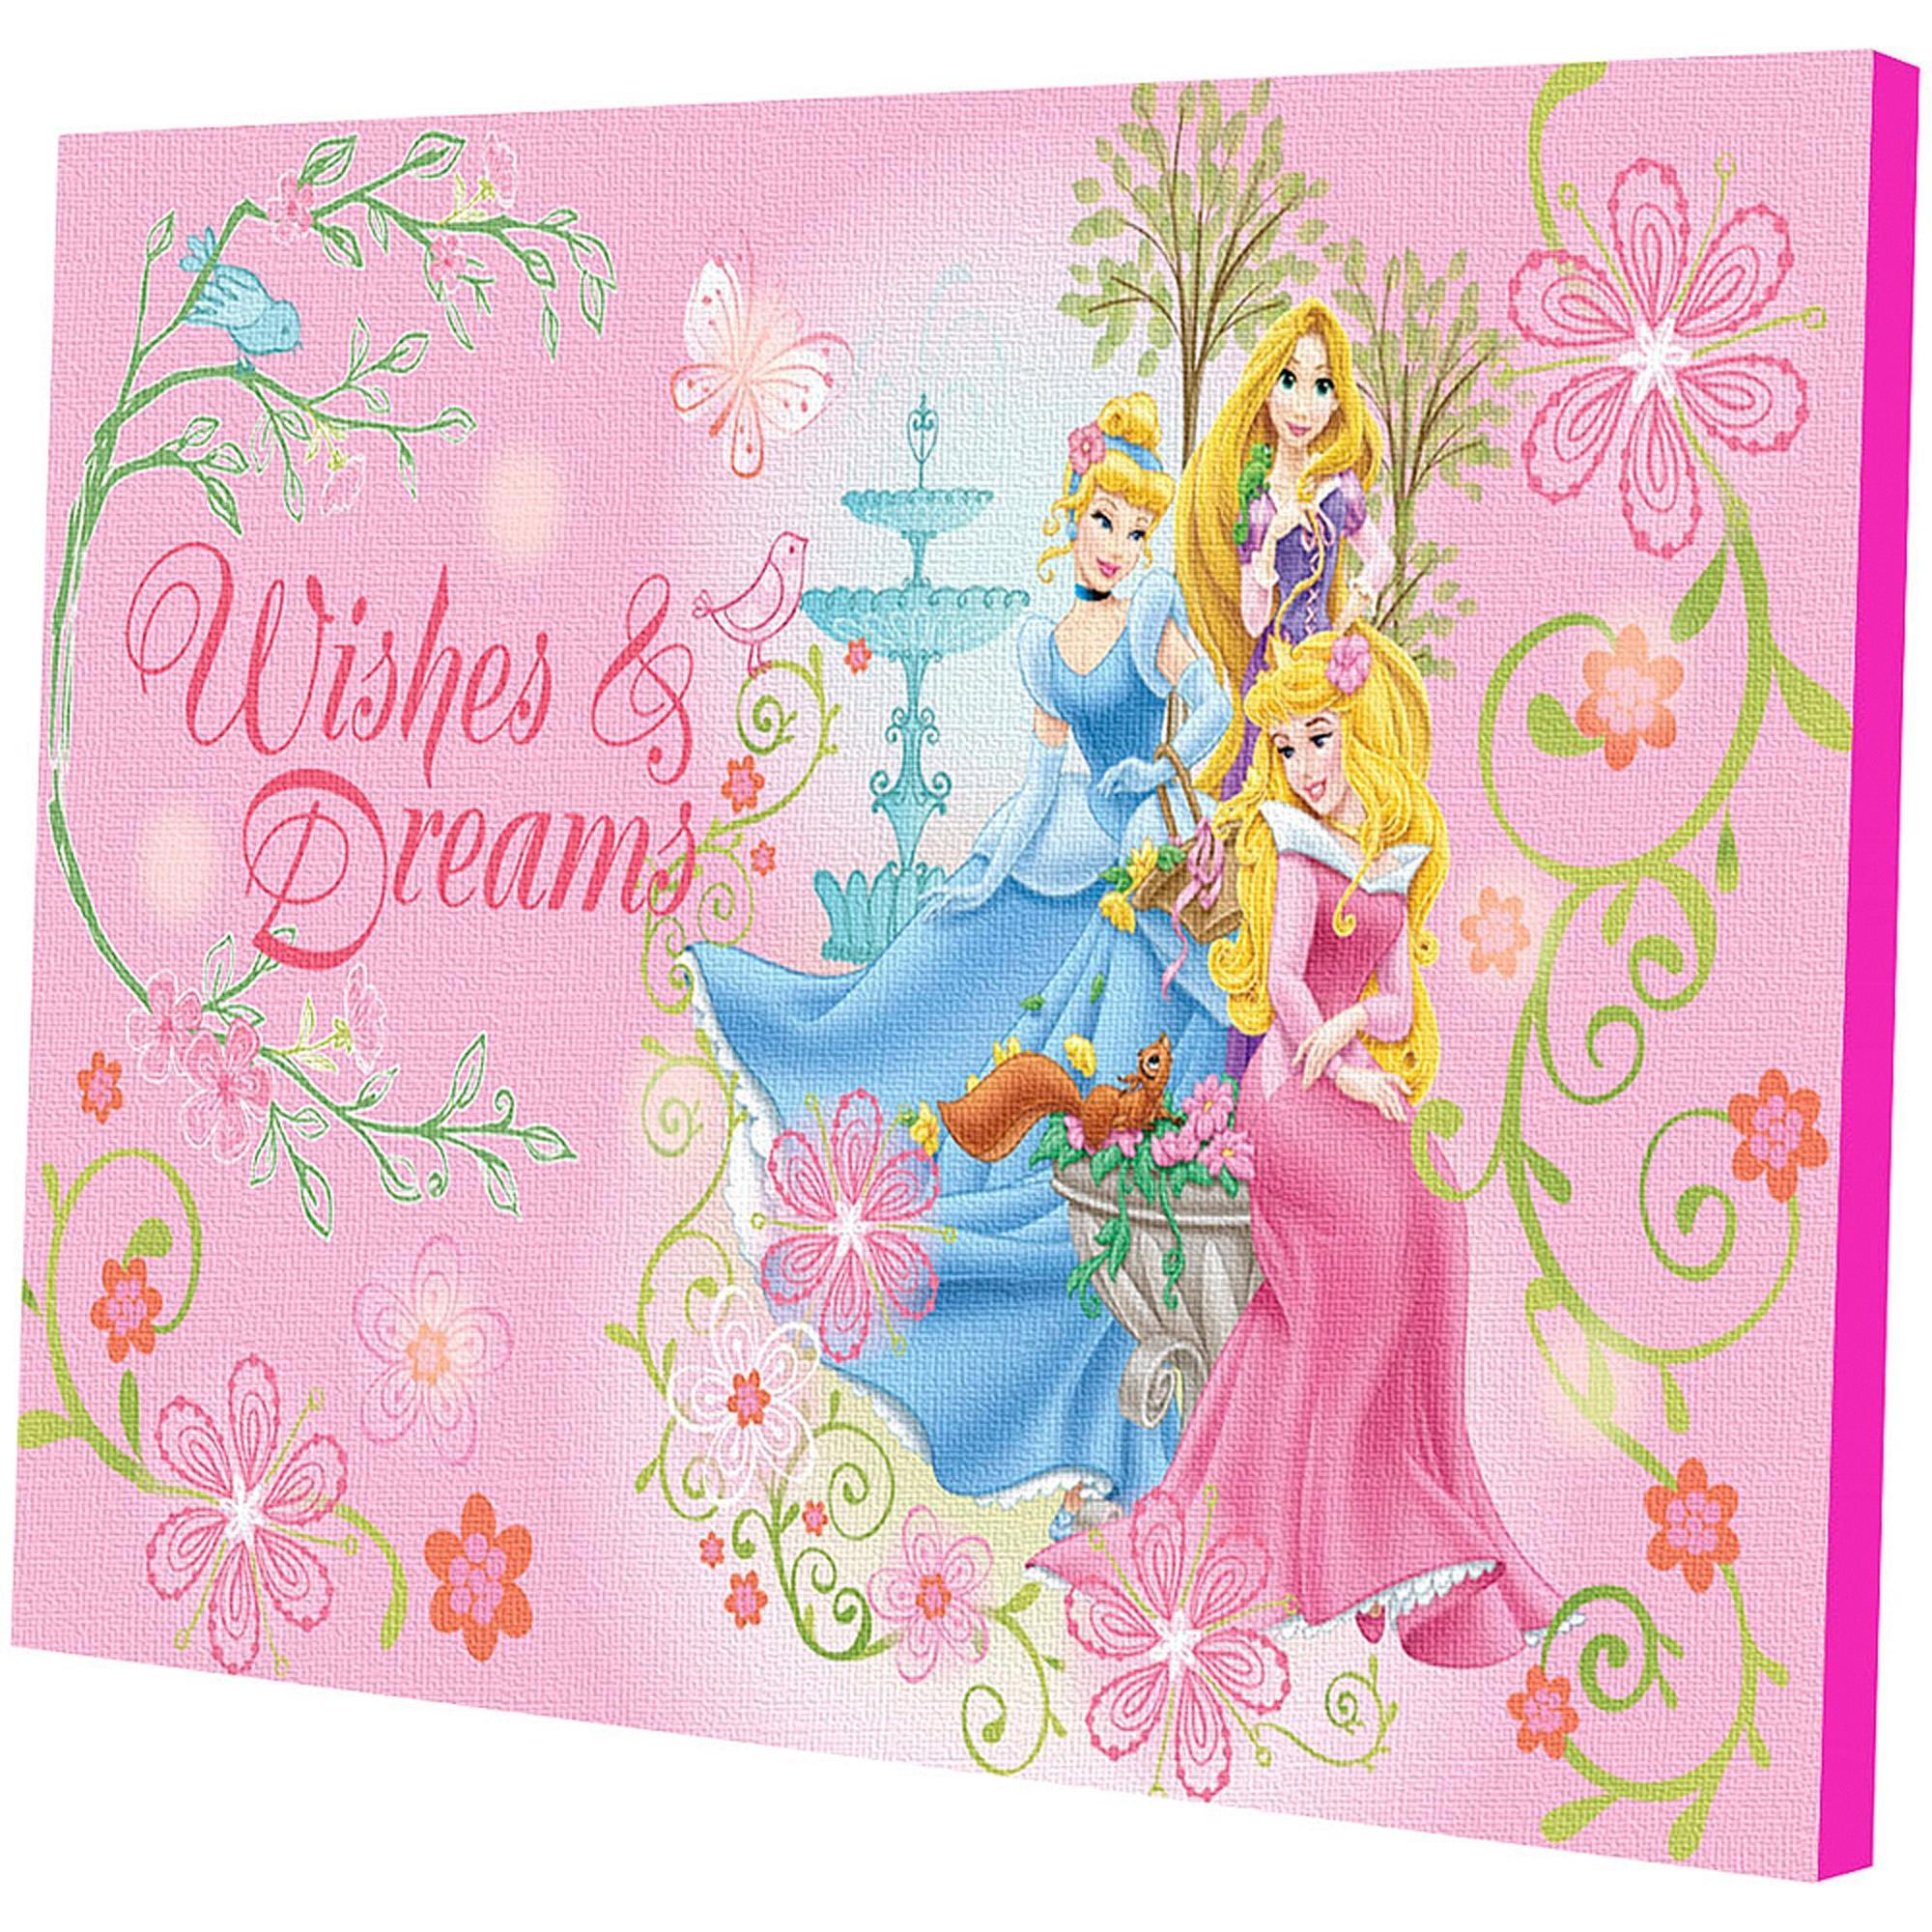 Disney Princess Led Light Up Canvas Wall Art – Walmart In Disney Princess Wall Art (View 6 of 20)